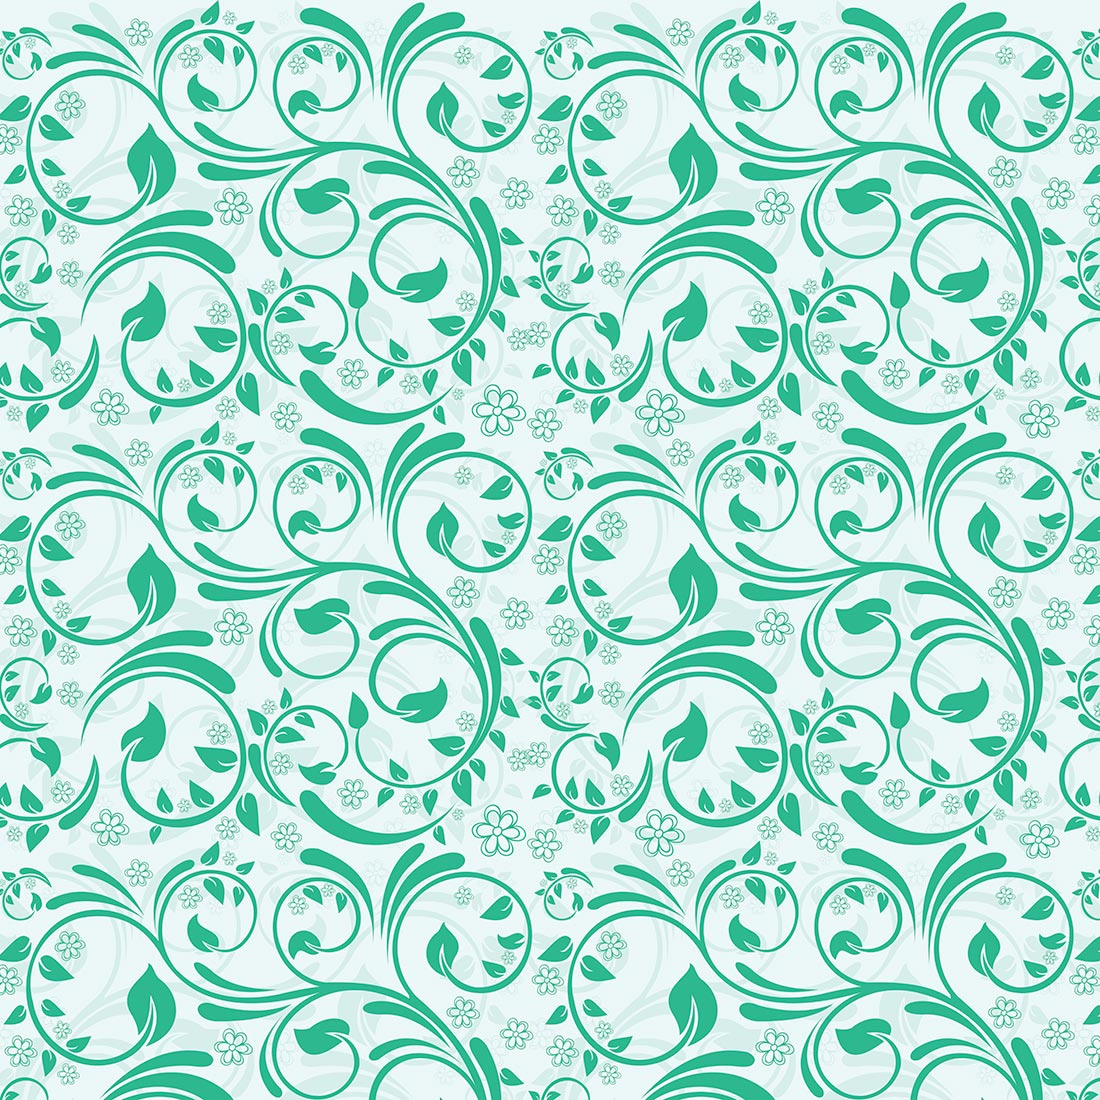 Papel de Parede Arabesco Floral Verde Água